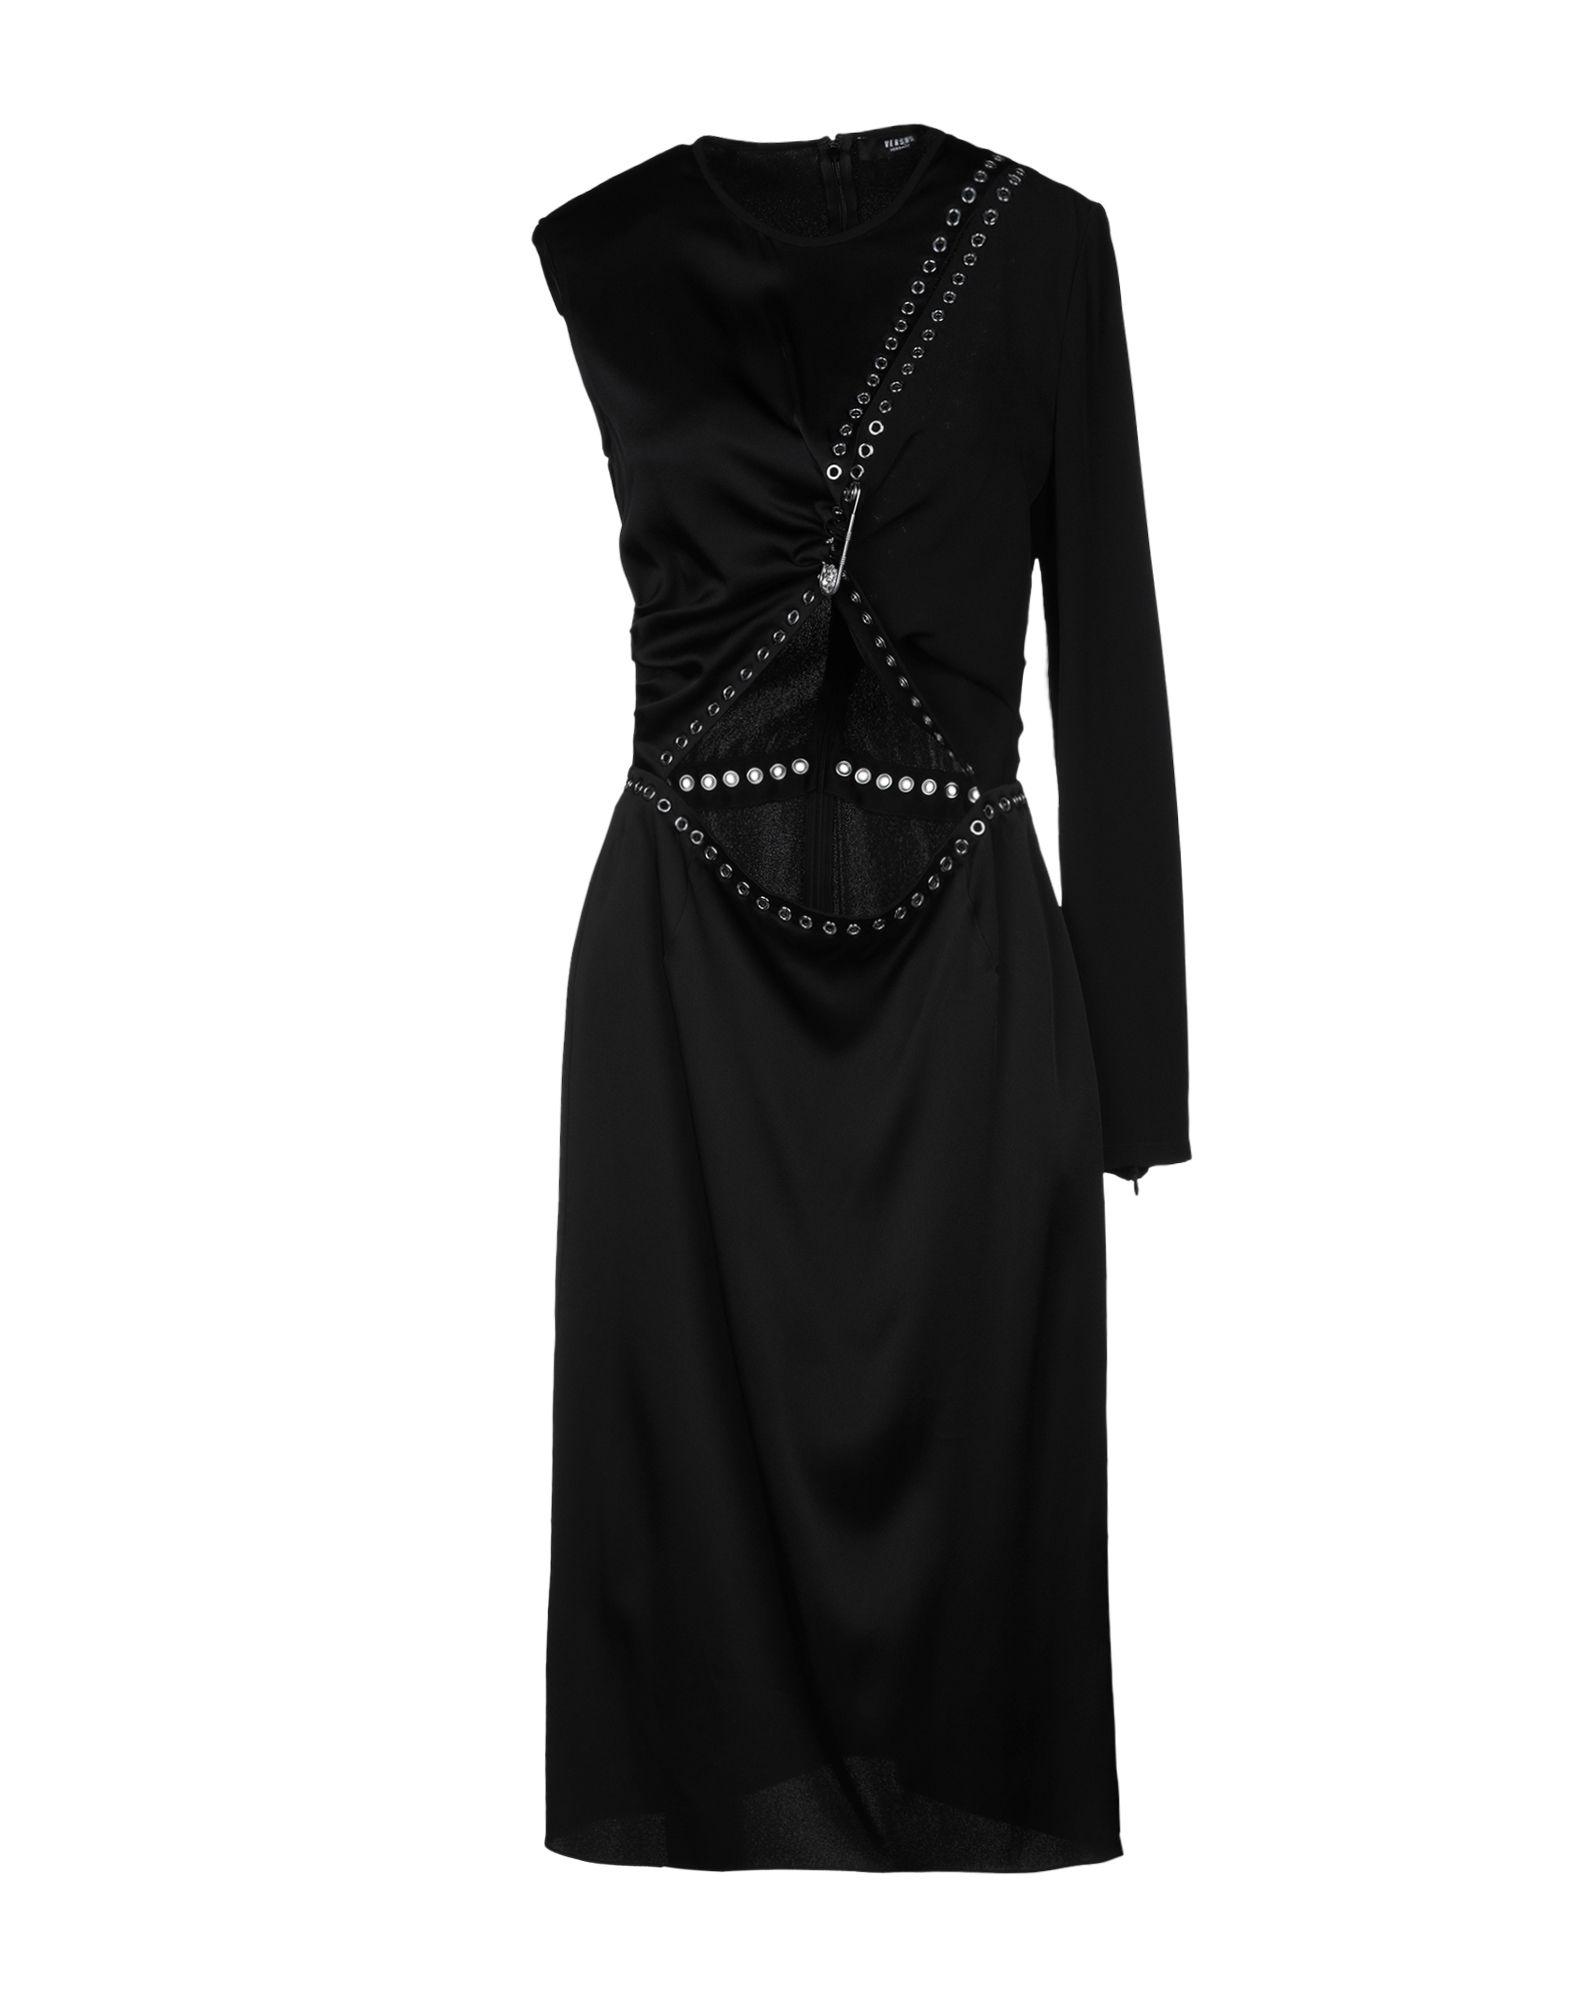 Фото - VERSUS VERSACE Платье длиной 3/4 versus versace платье длиной 3 4